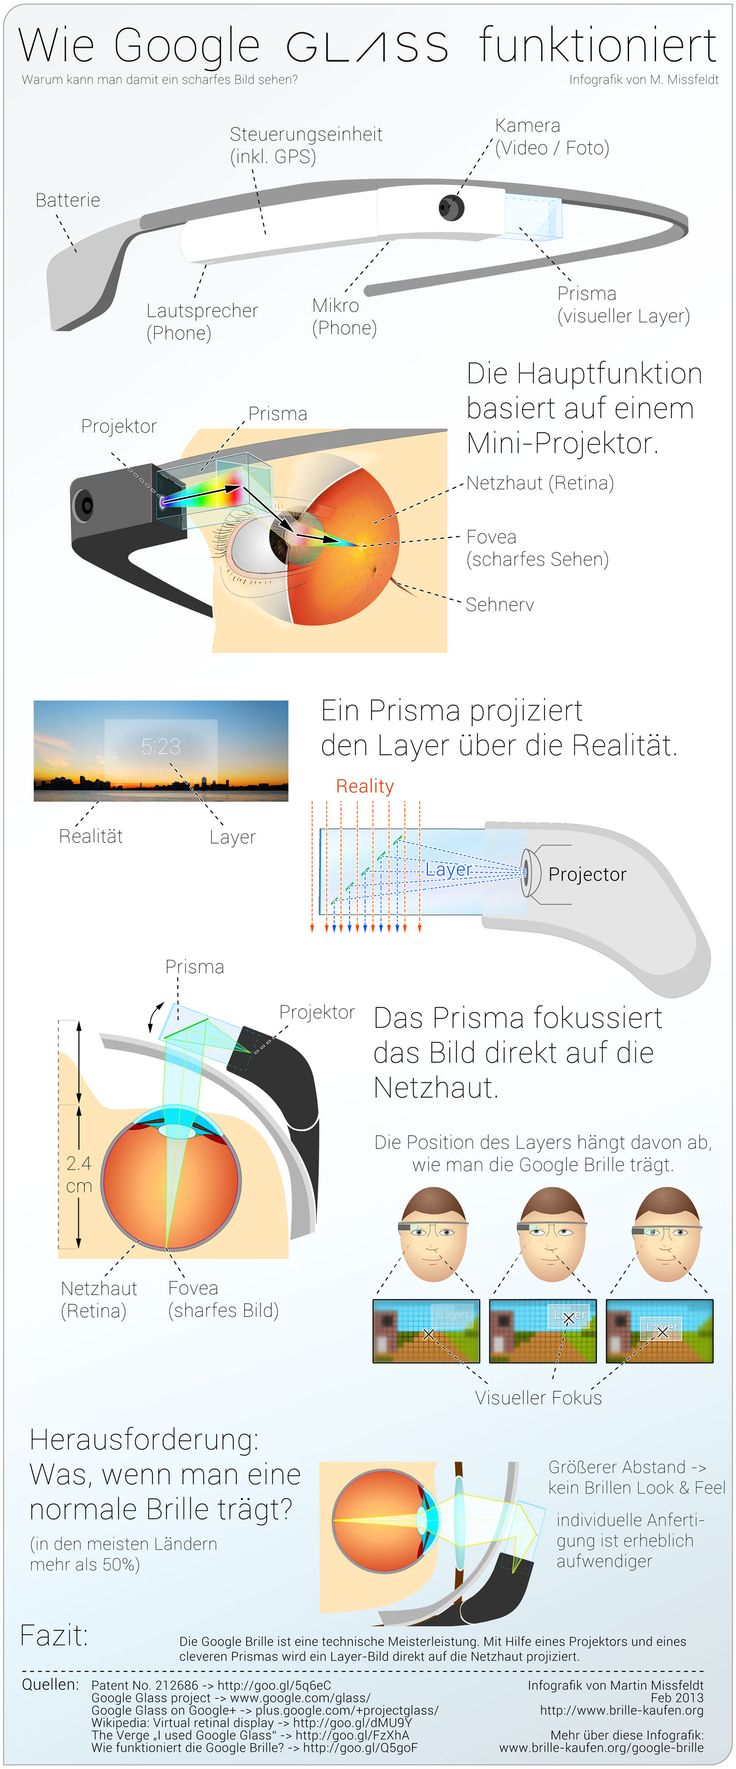 Google-BrilleGoogle Glasses, Glasses Work, Gadgets, Technology, Stuff, Social Media, Glasses Infographic, Work Infographic, Googleglass